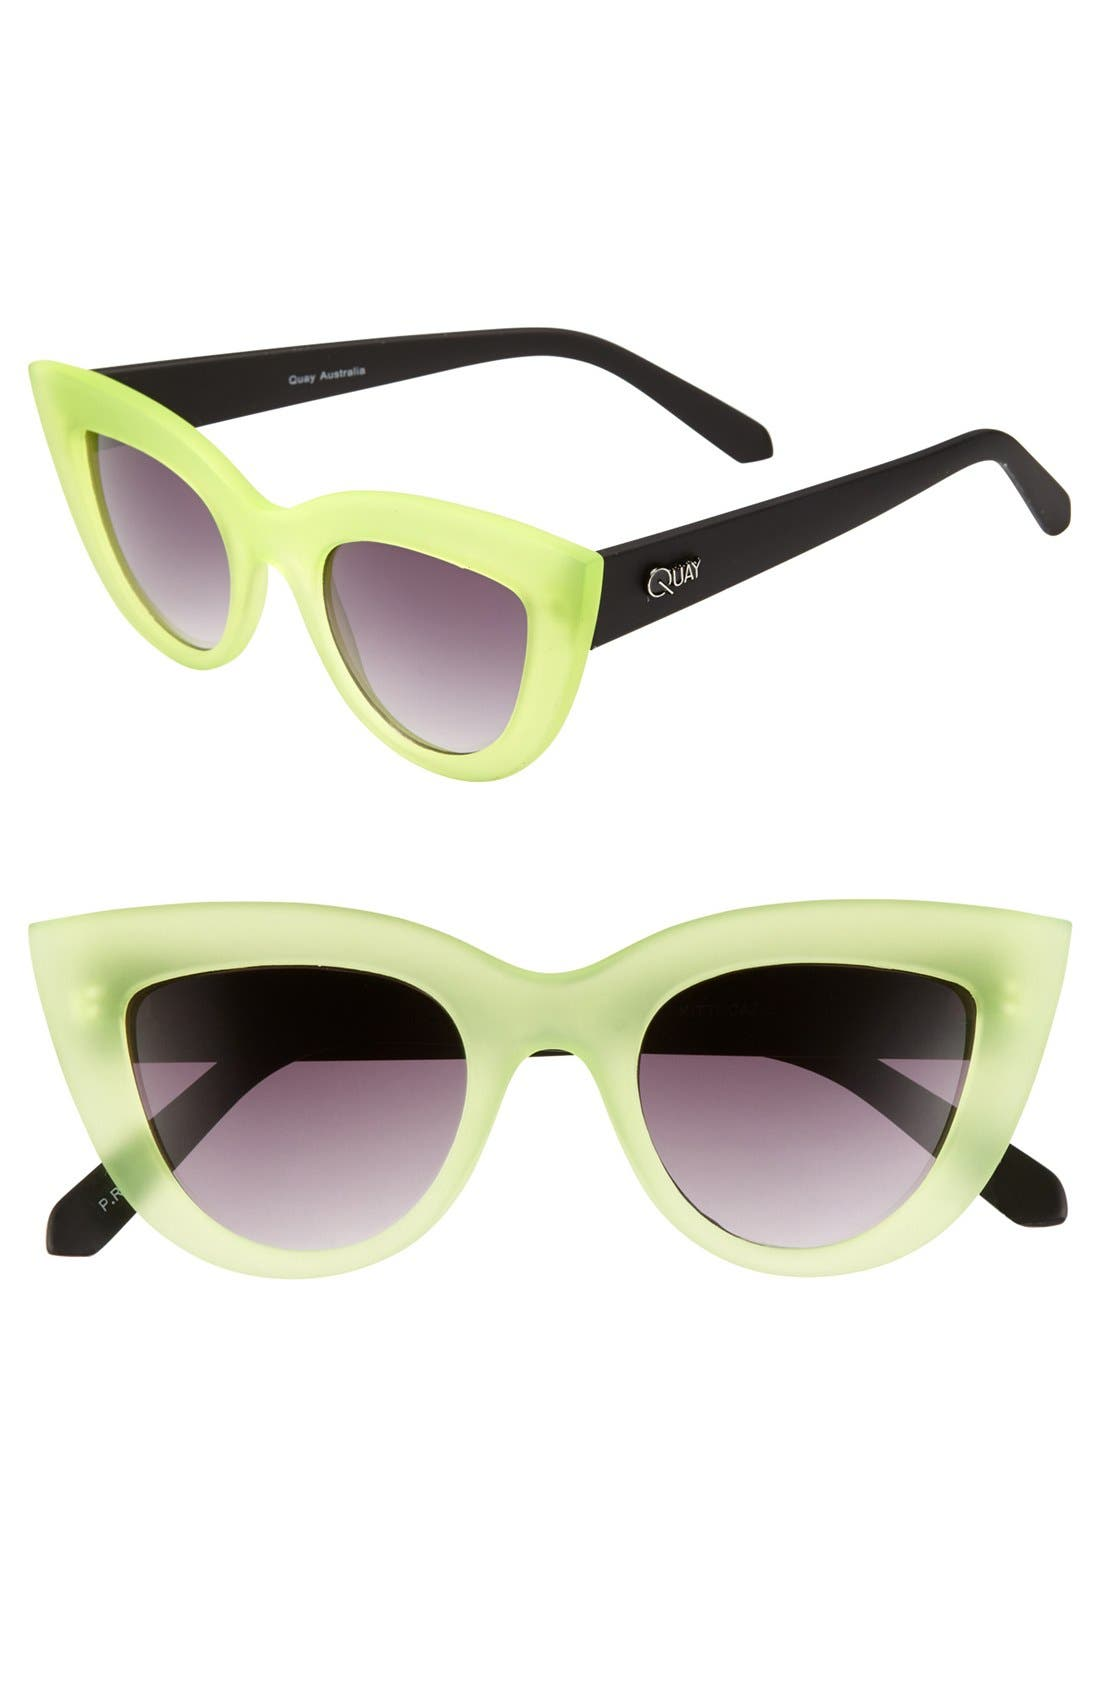 Alternate Image 1 Selected - Quay 'Kitti' Sunglasses